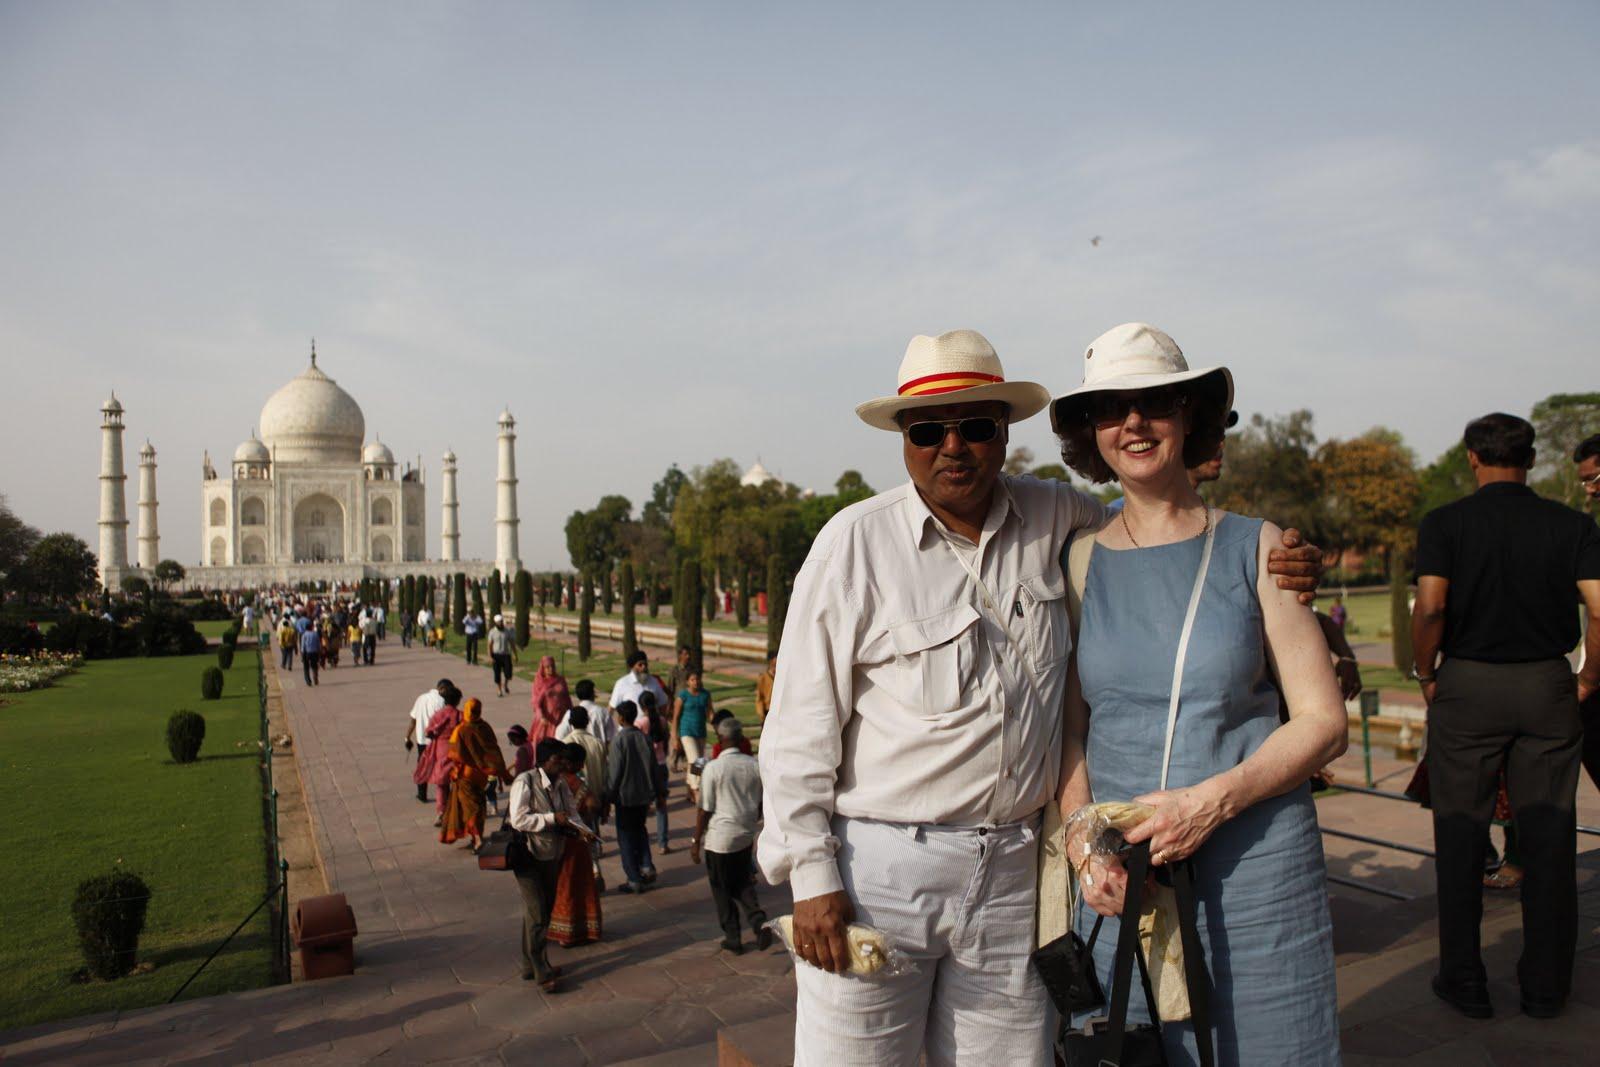 maharajas express indian splendor itinerary luxury train travel